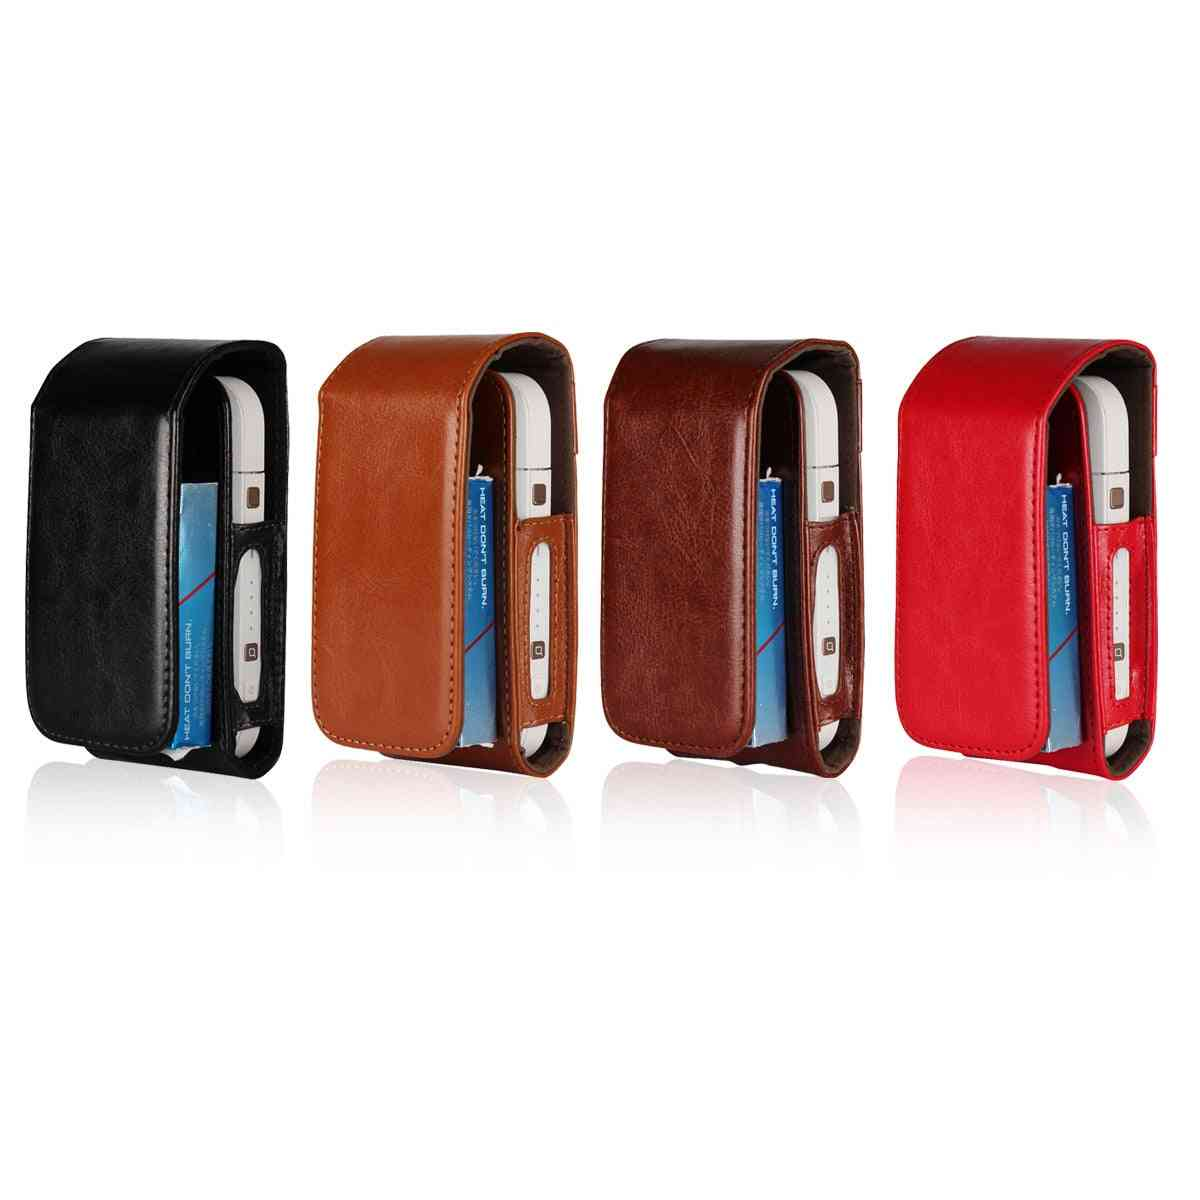 Portable Mini Bag Plus Case Cover, Protective Pouch